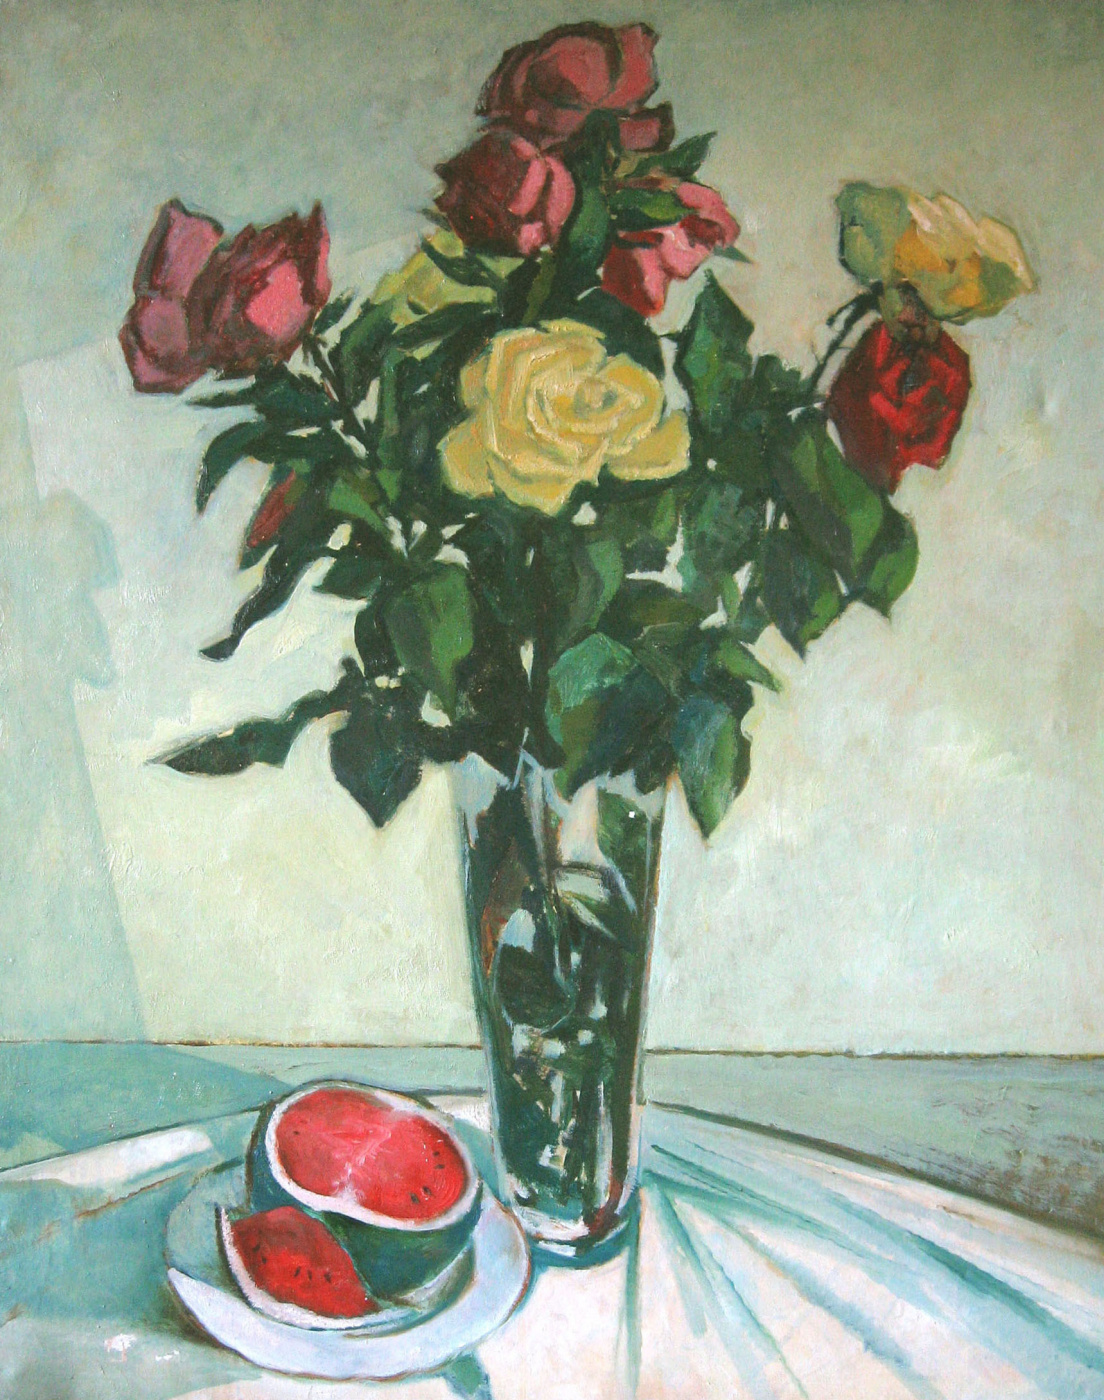 Александр Викторович Беляков. Still life with roses and watermelon